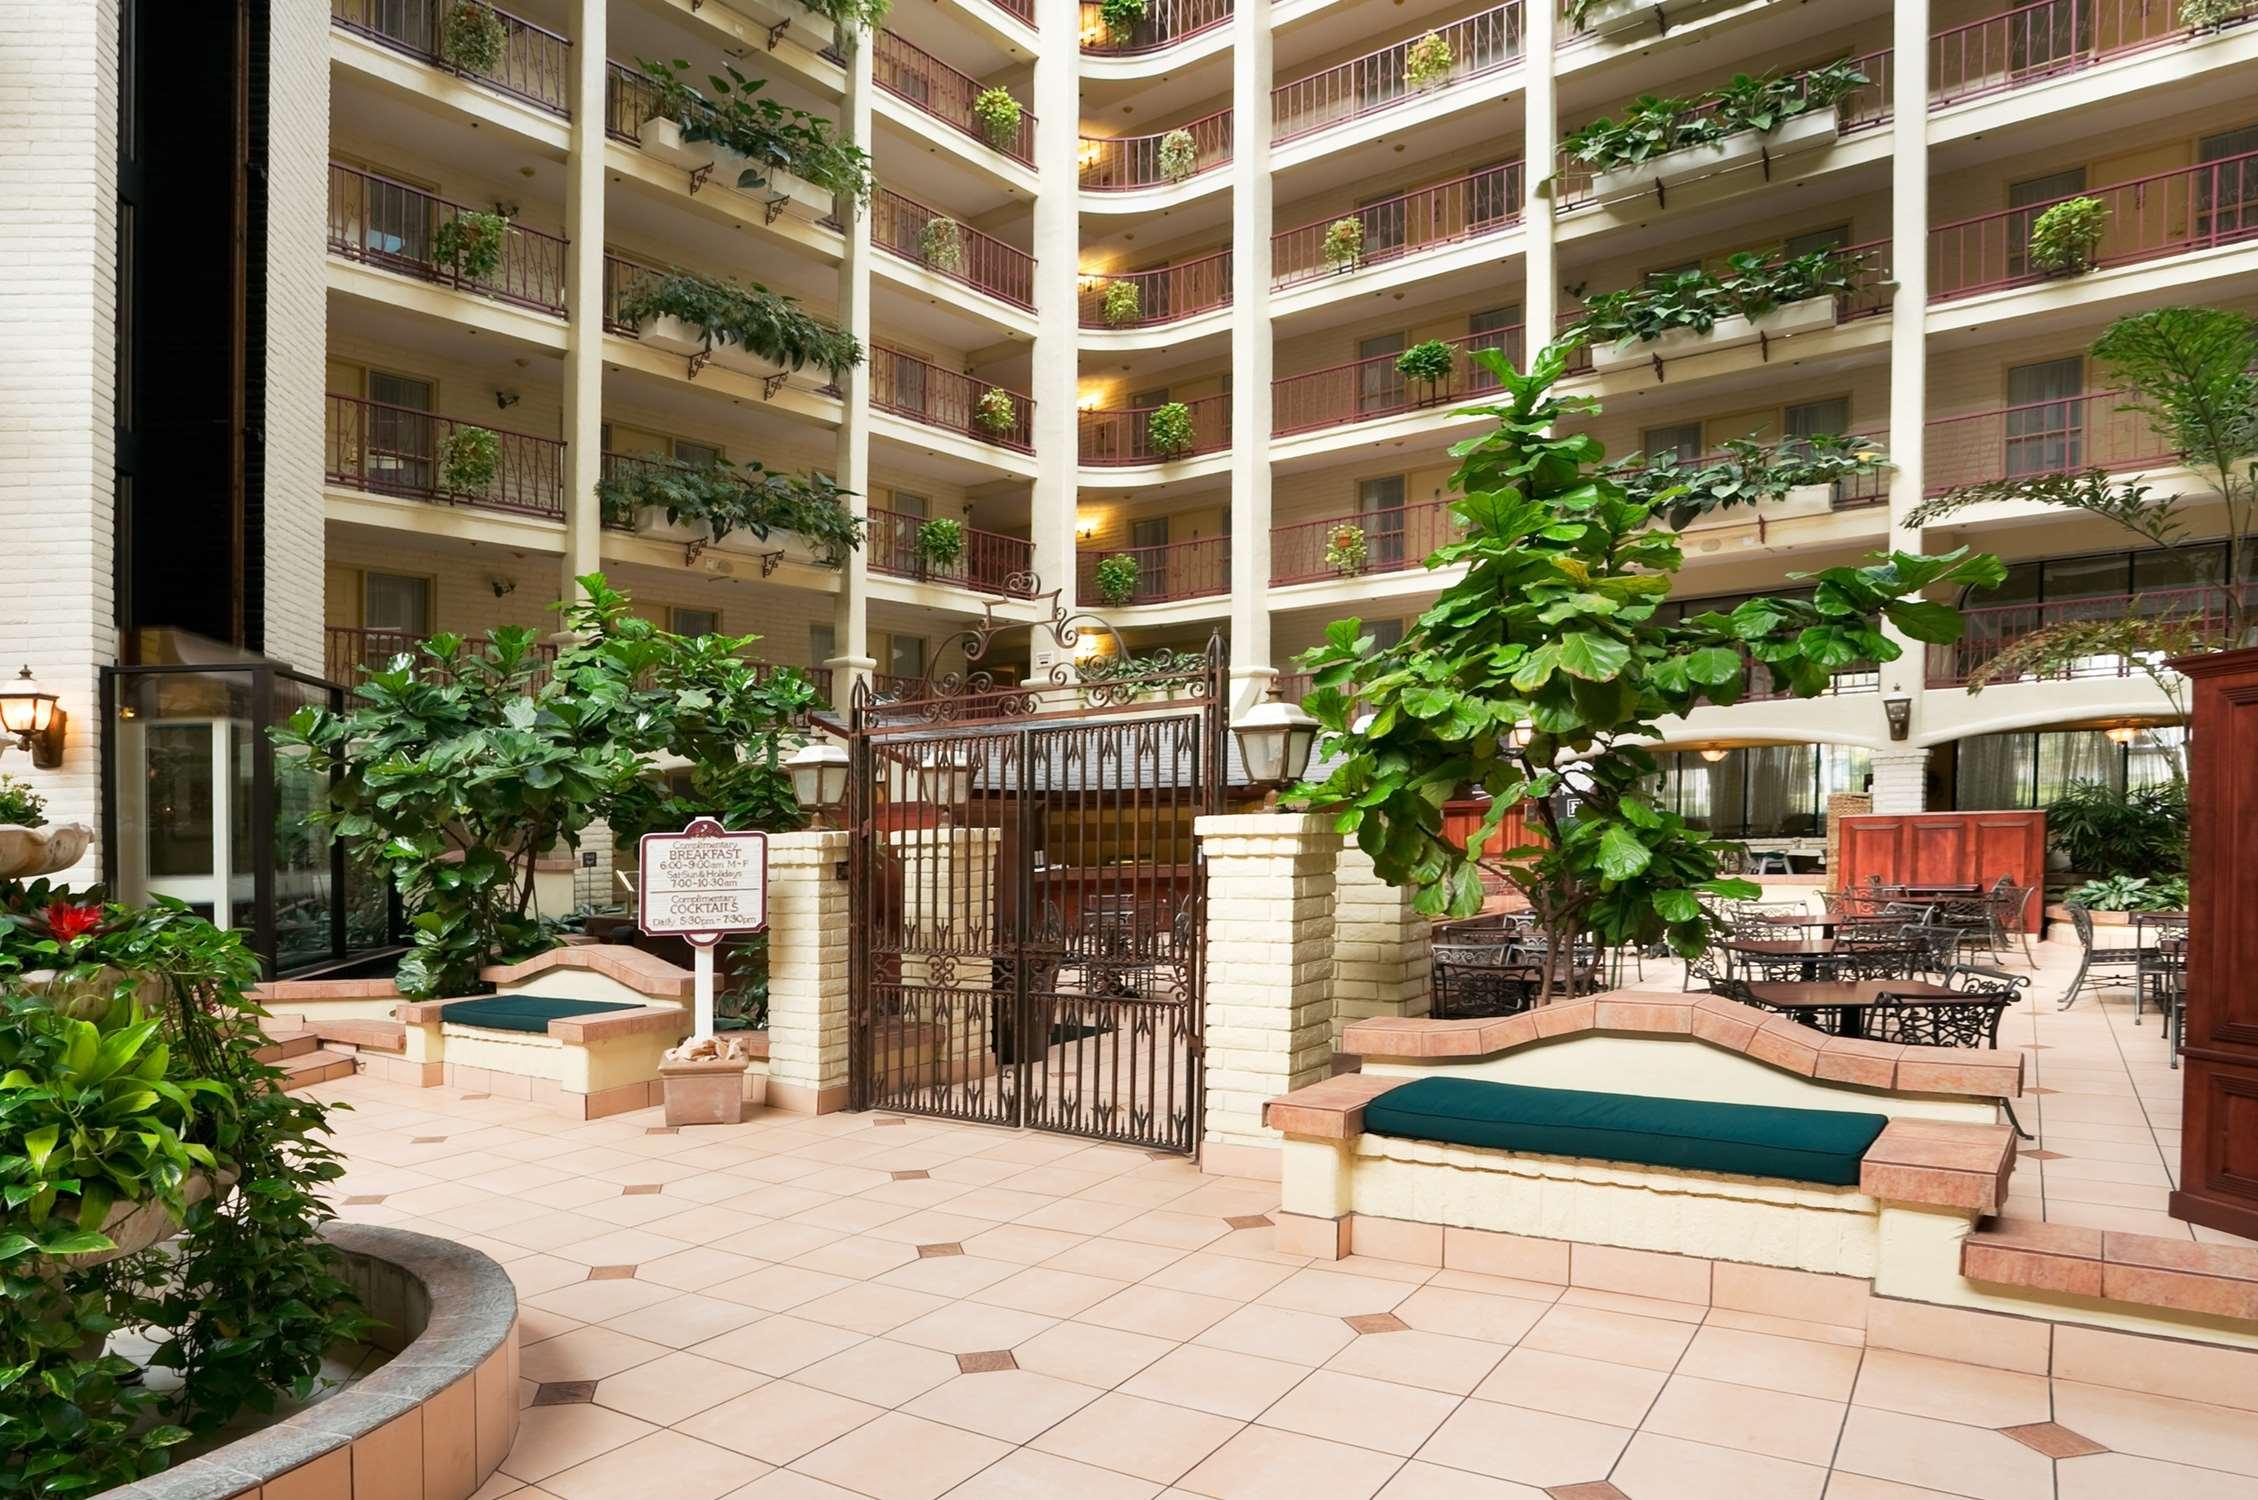 Embassy Suites by Hilton Arcadia Pasadena Area image 9